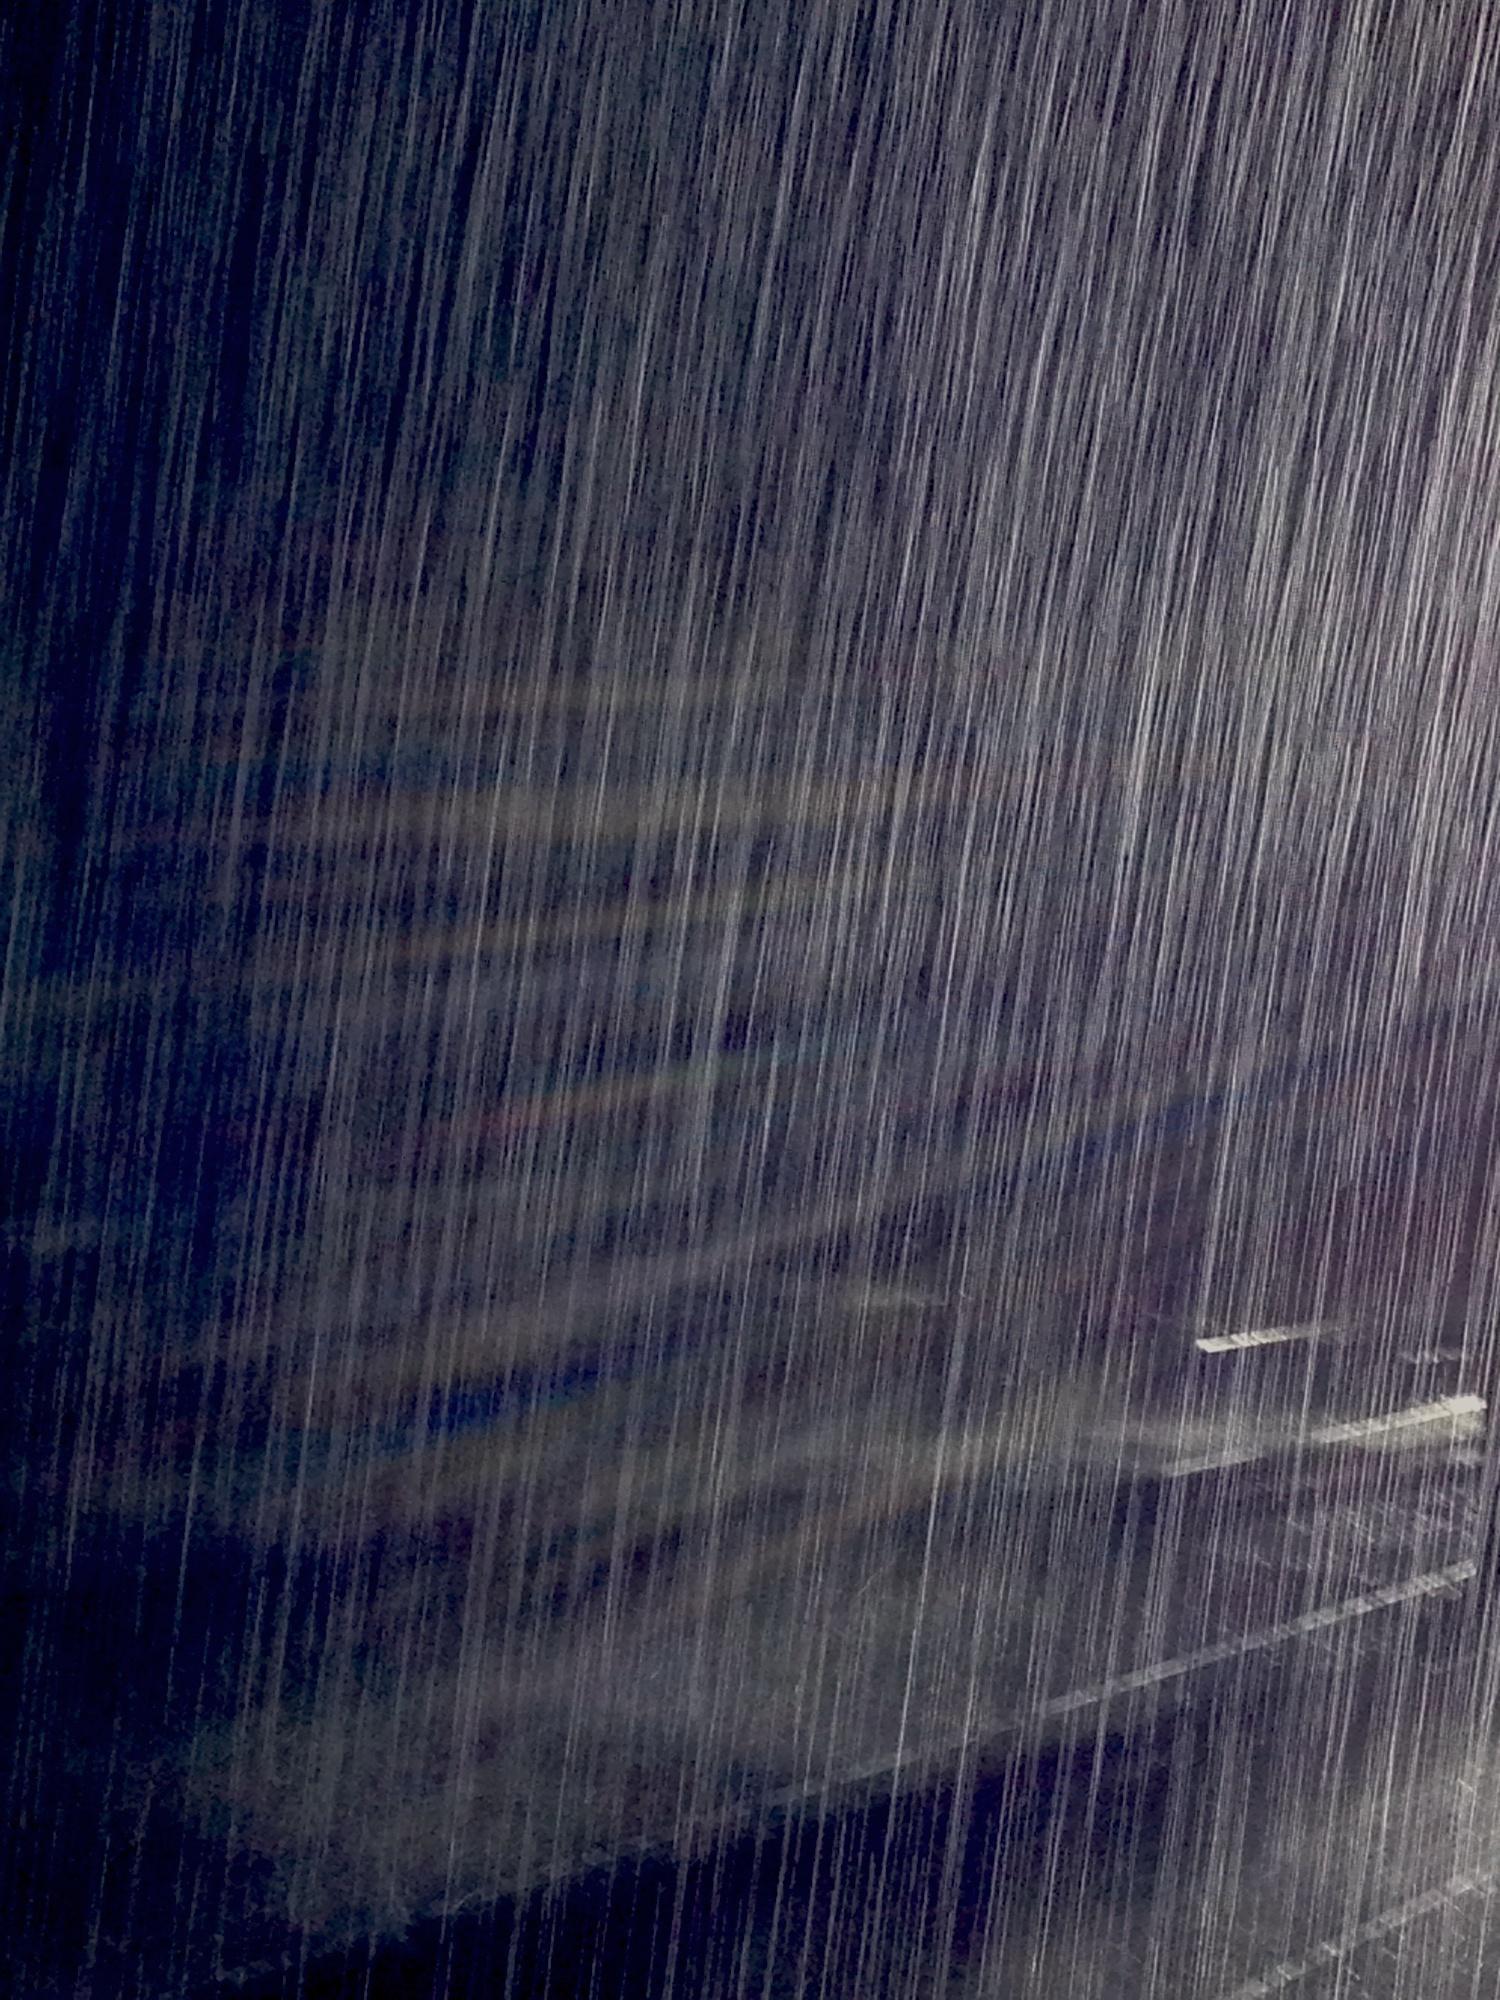 rain rm.jpg